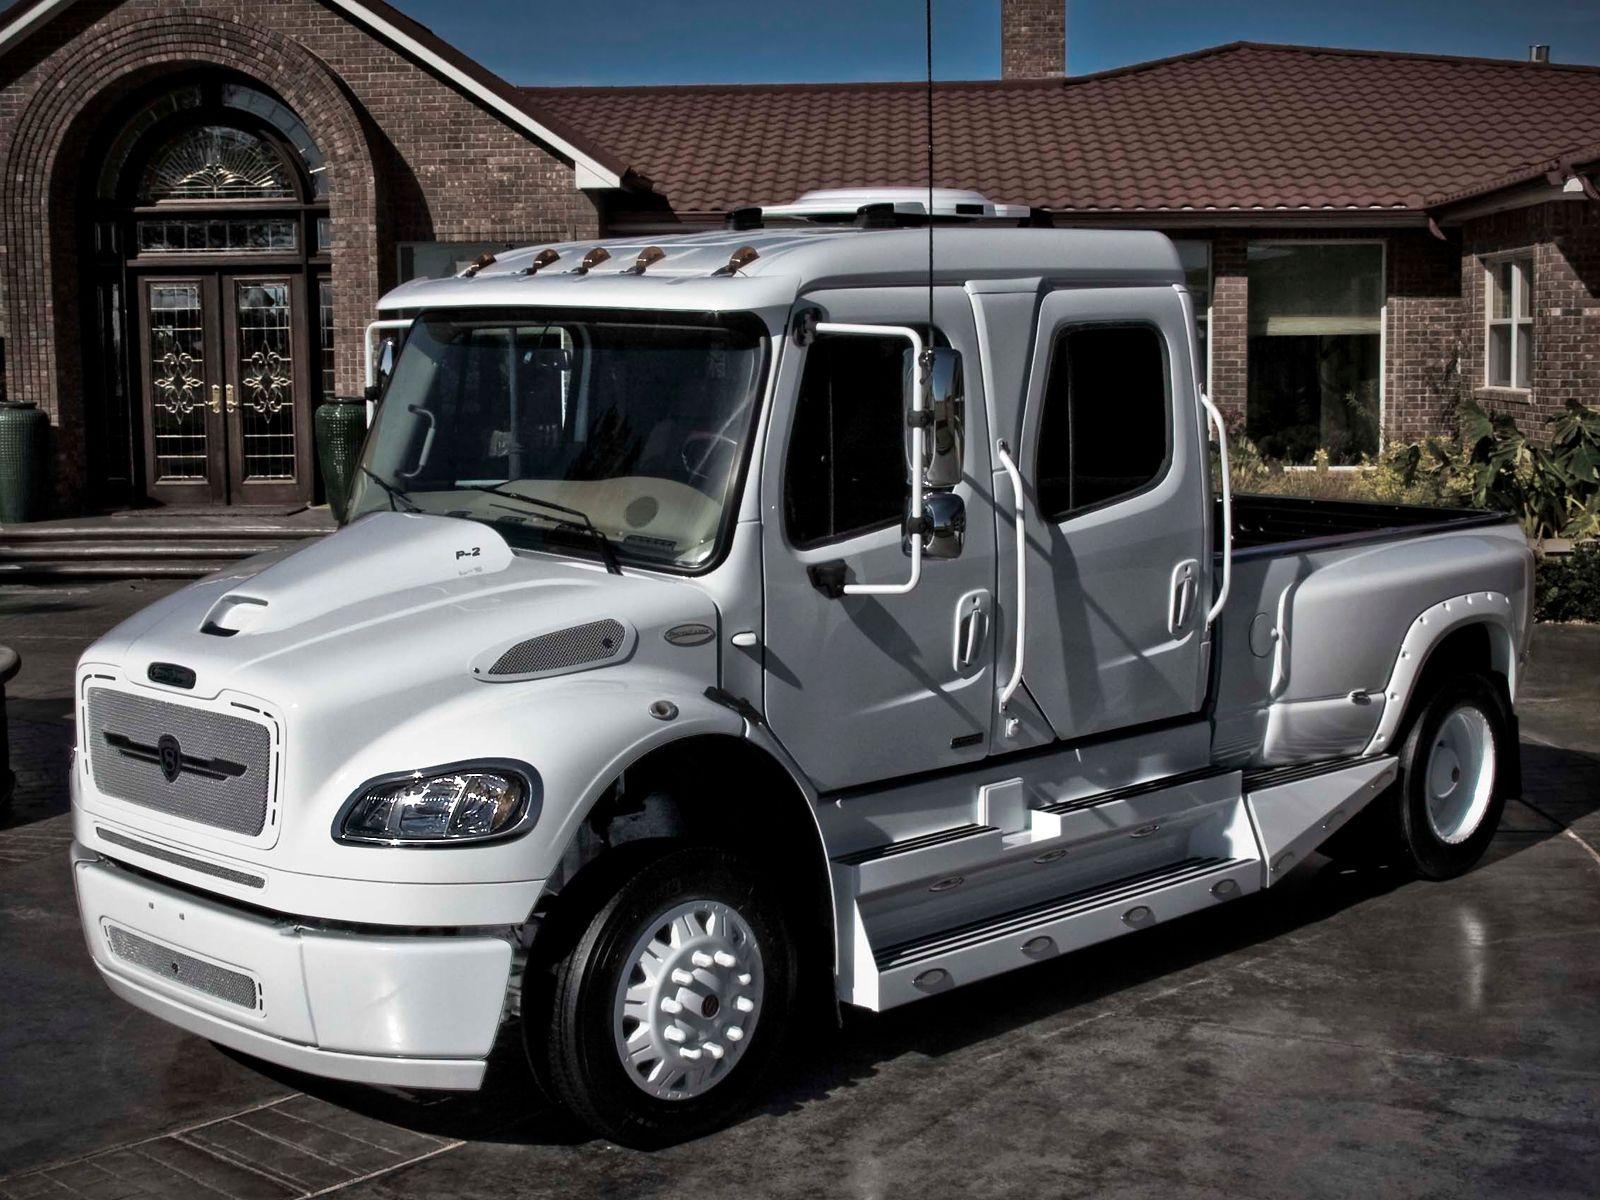 Pin Strut Freightliner Business Class M2 Sportchassis Grille Collection On Pinterest Freightliner Diesel Trucks Freightliner Trucks